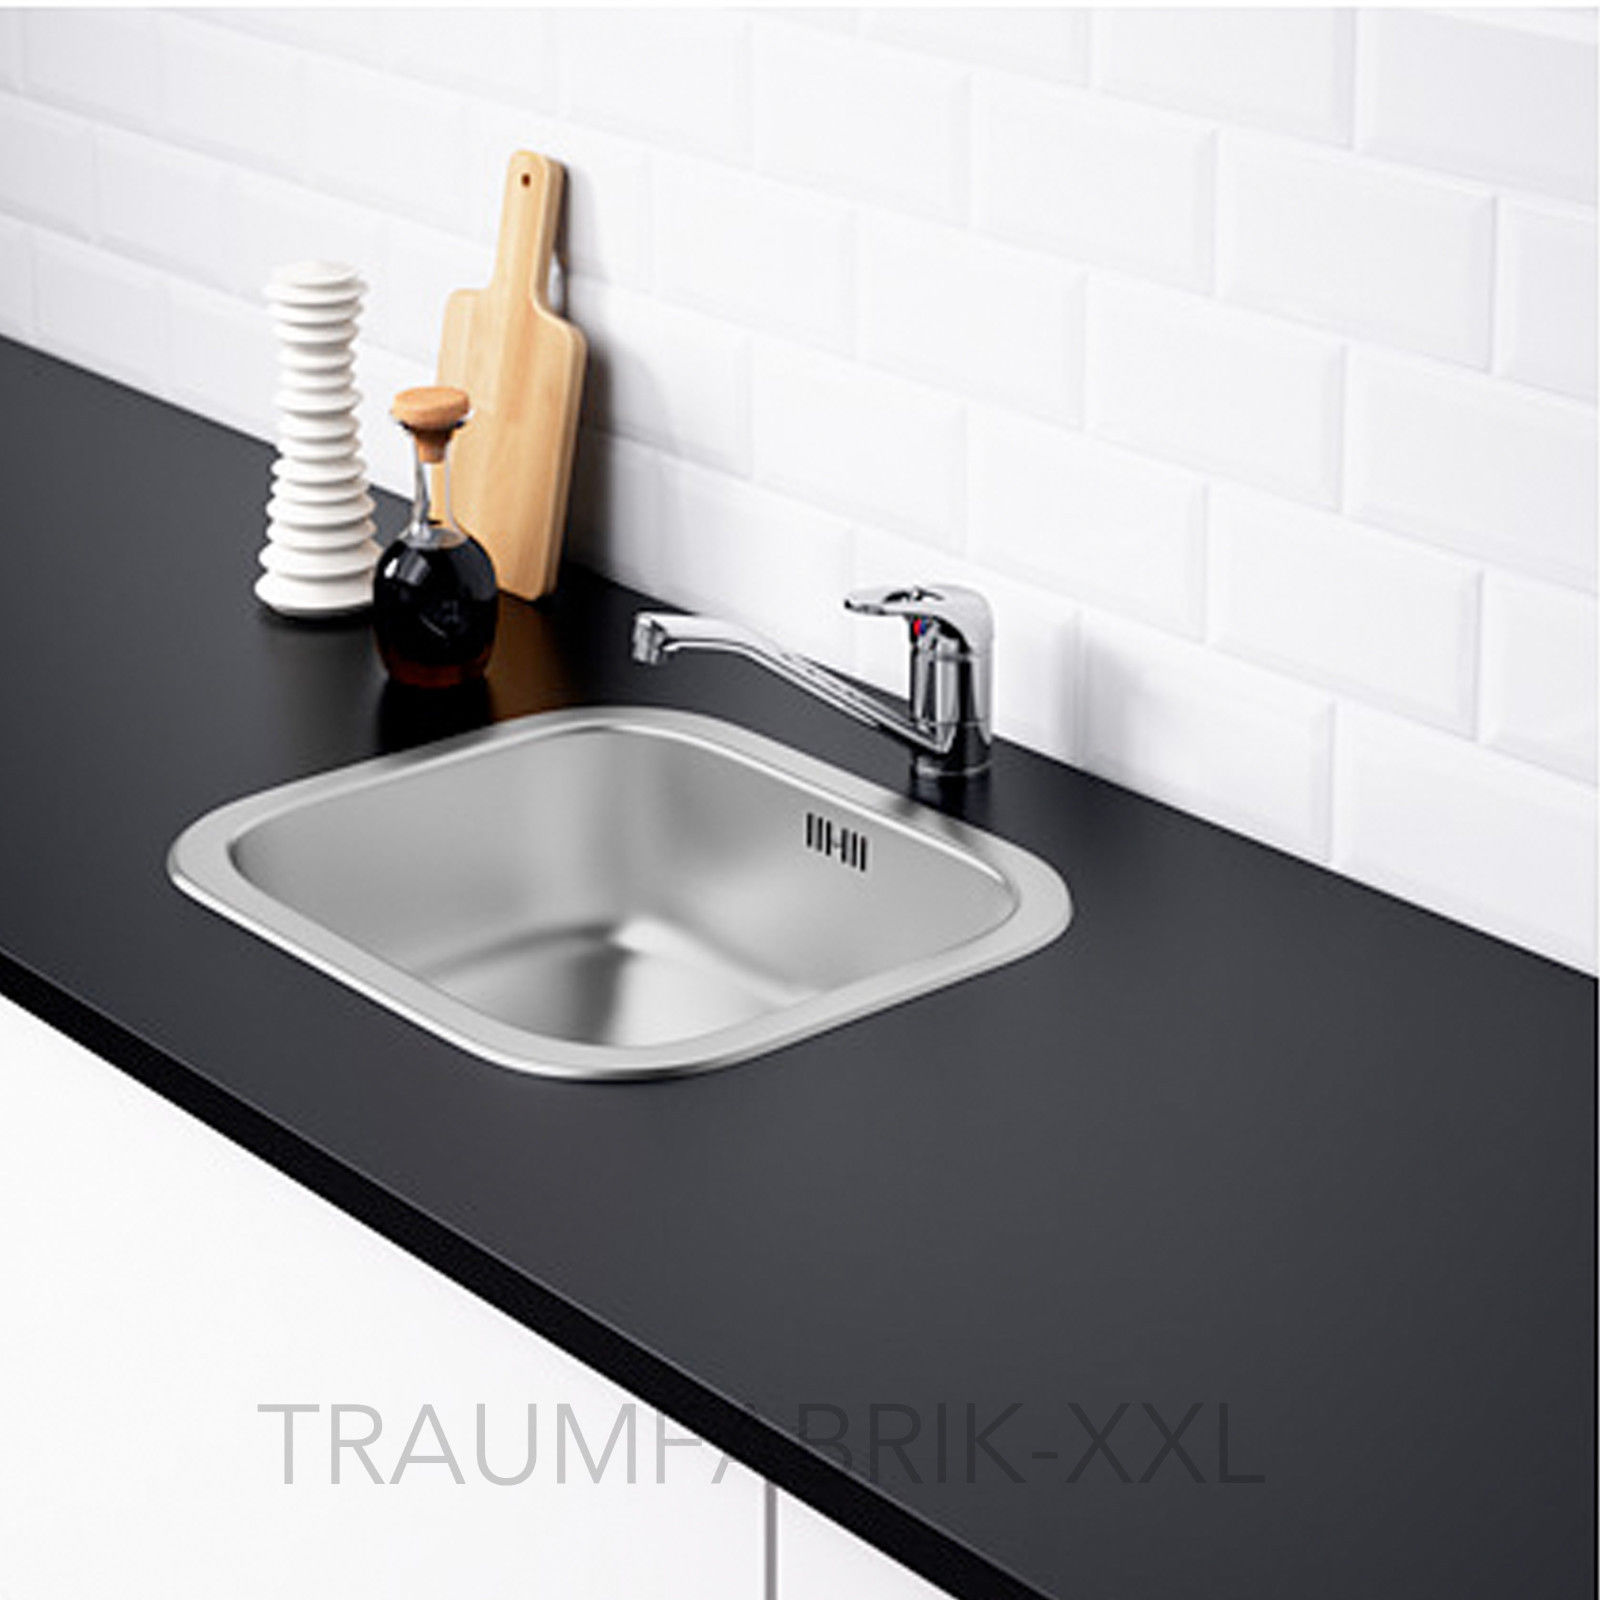 IKEA FYNDIG Spülbecken Spüle Einbauspüle Küchenspüle Edelstahl ...